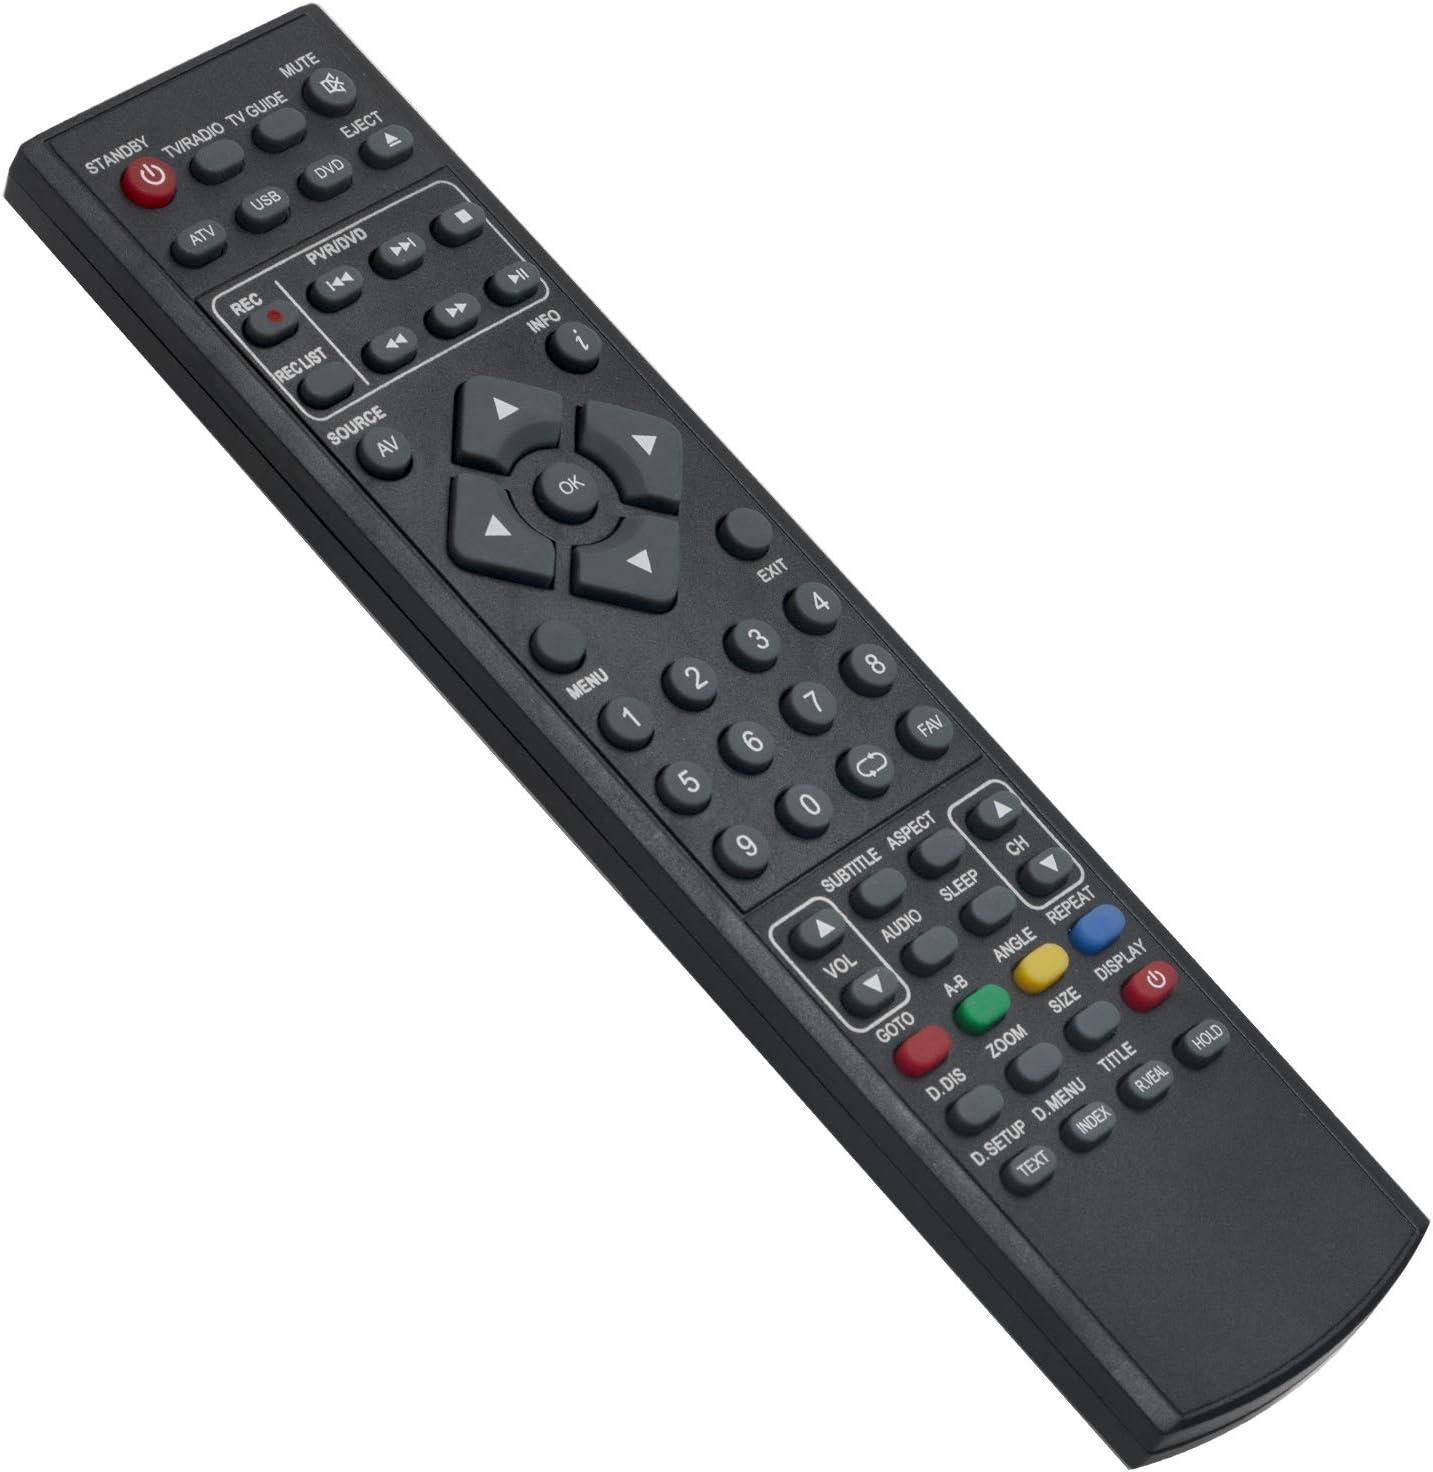 32/124I-WB-5B-HBKUP-UK Mando a Distancia de Repuesto - VINABTY Reemplace Control Remoto para BLAUPUNKT TV 32-124I-WB-5B-HBKUP-UK 32/122I-GB-5B-HBKU-UK Remote Controller